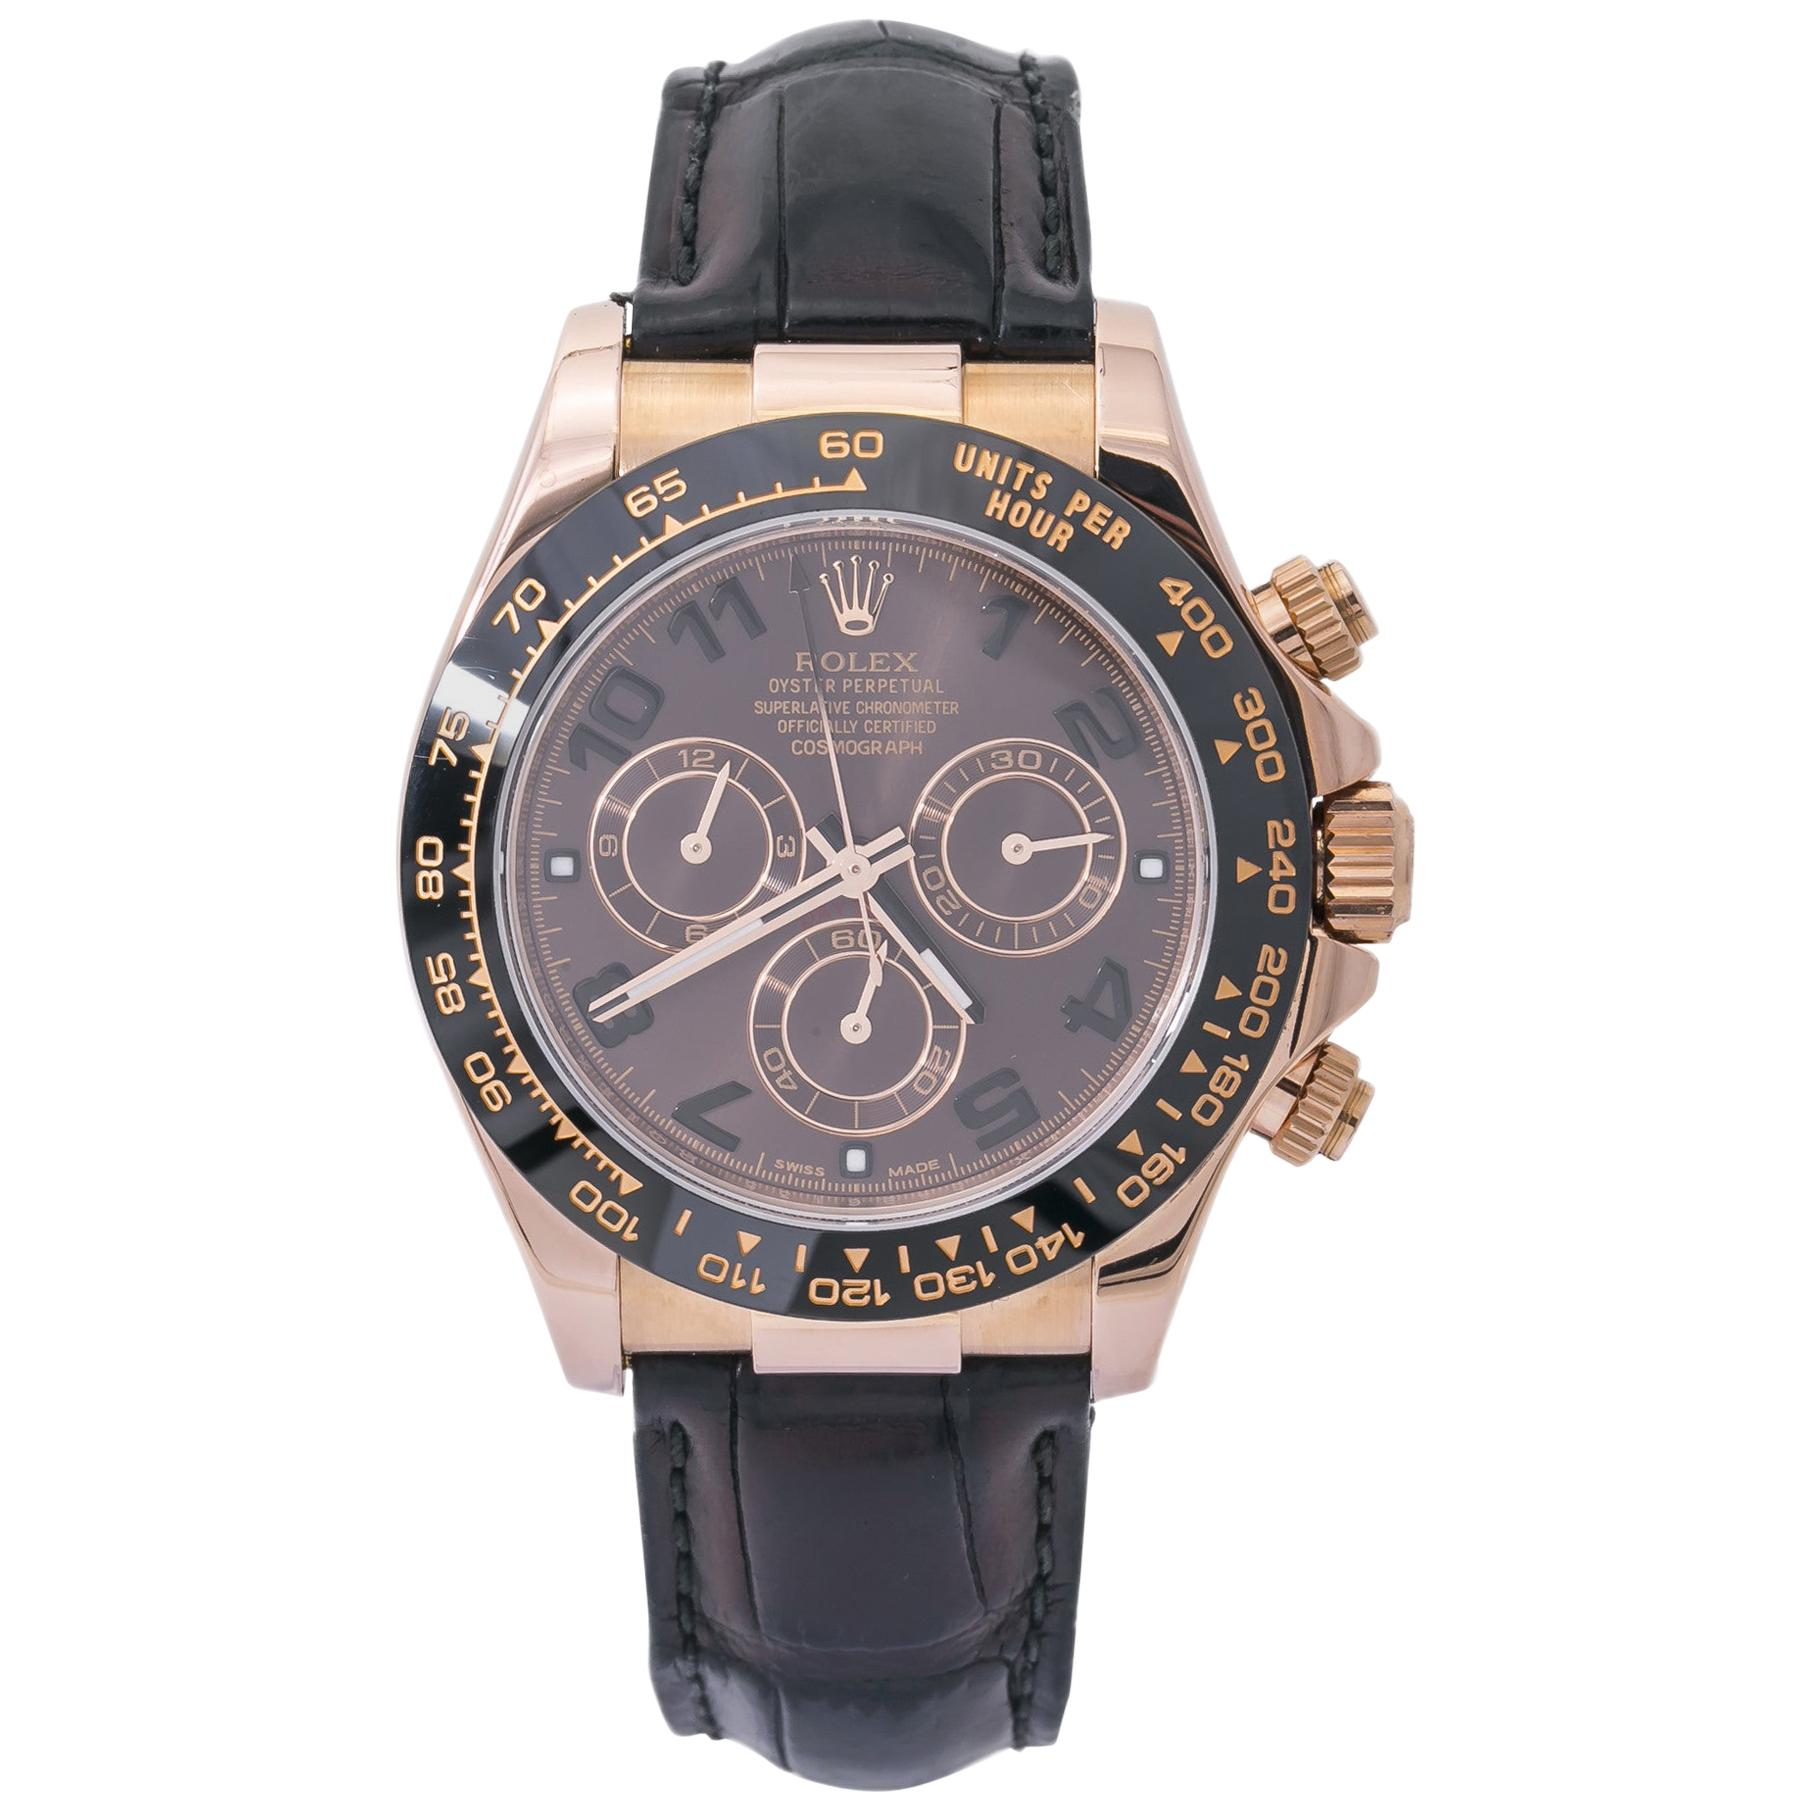 Rolex Daytona 116515, Brown Dial, Certified and Warranty